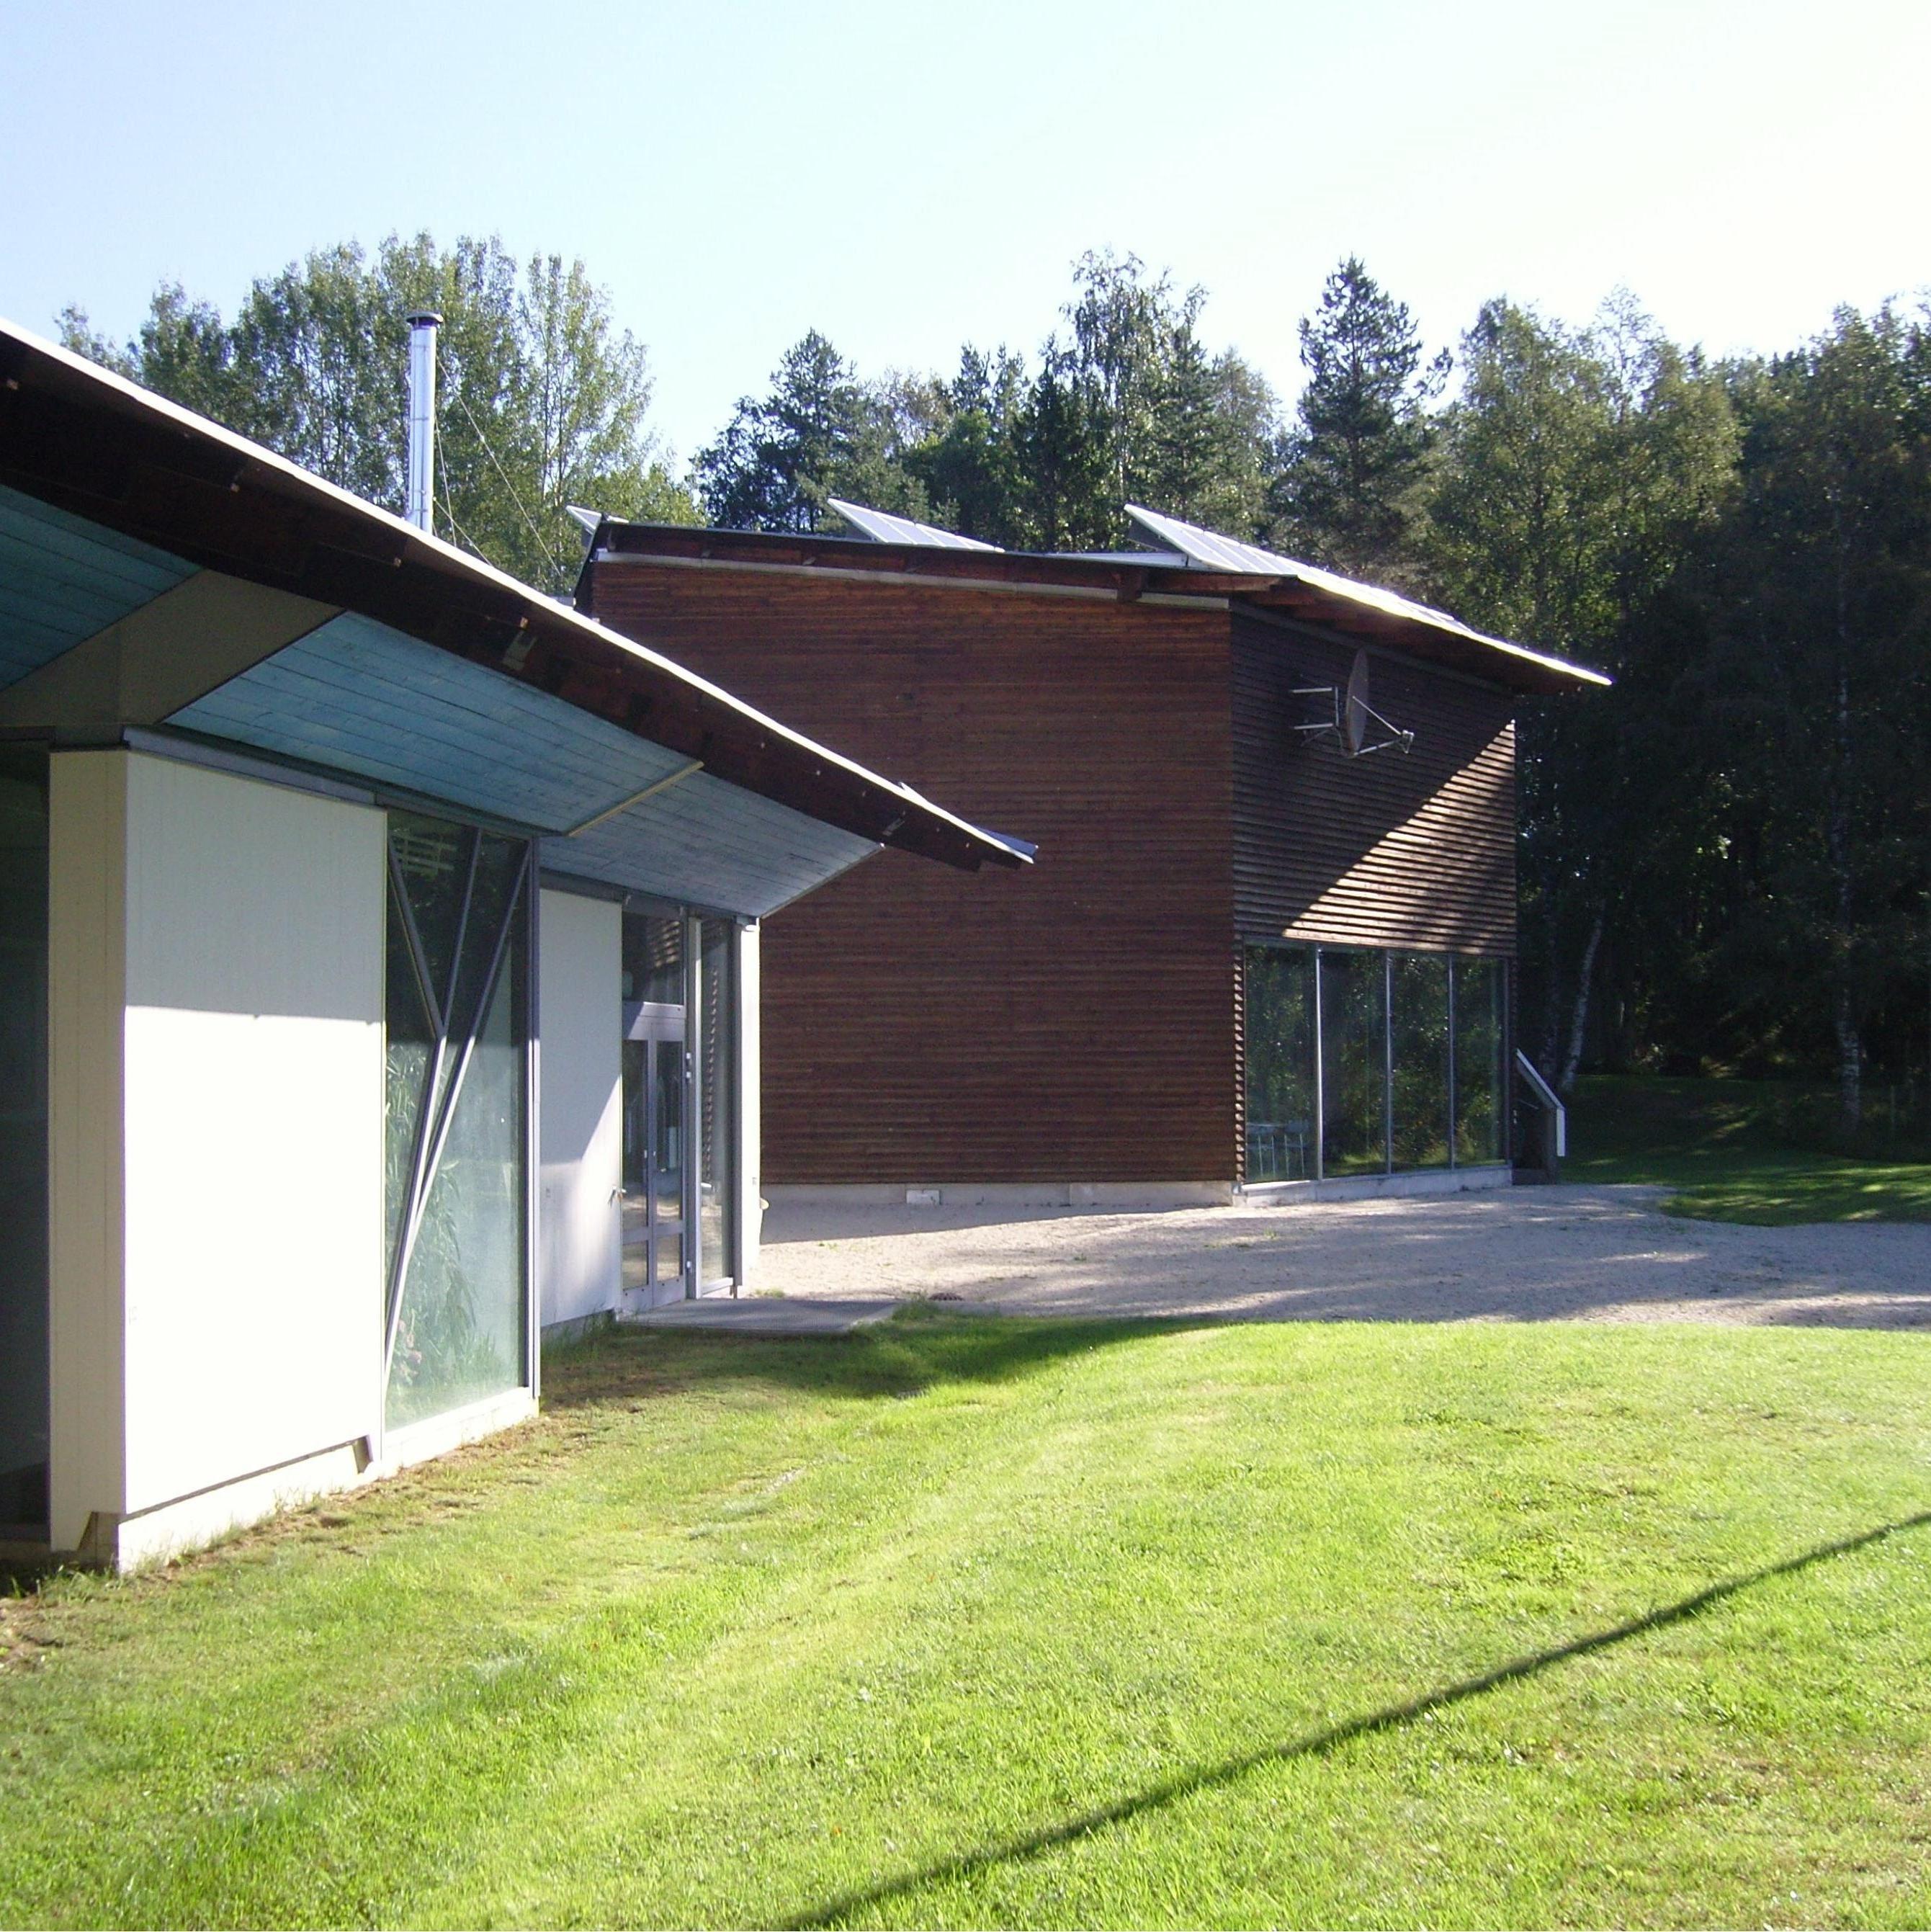 Restaurant Ramsele Konferens & forskarcentrum